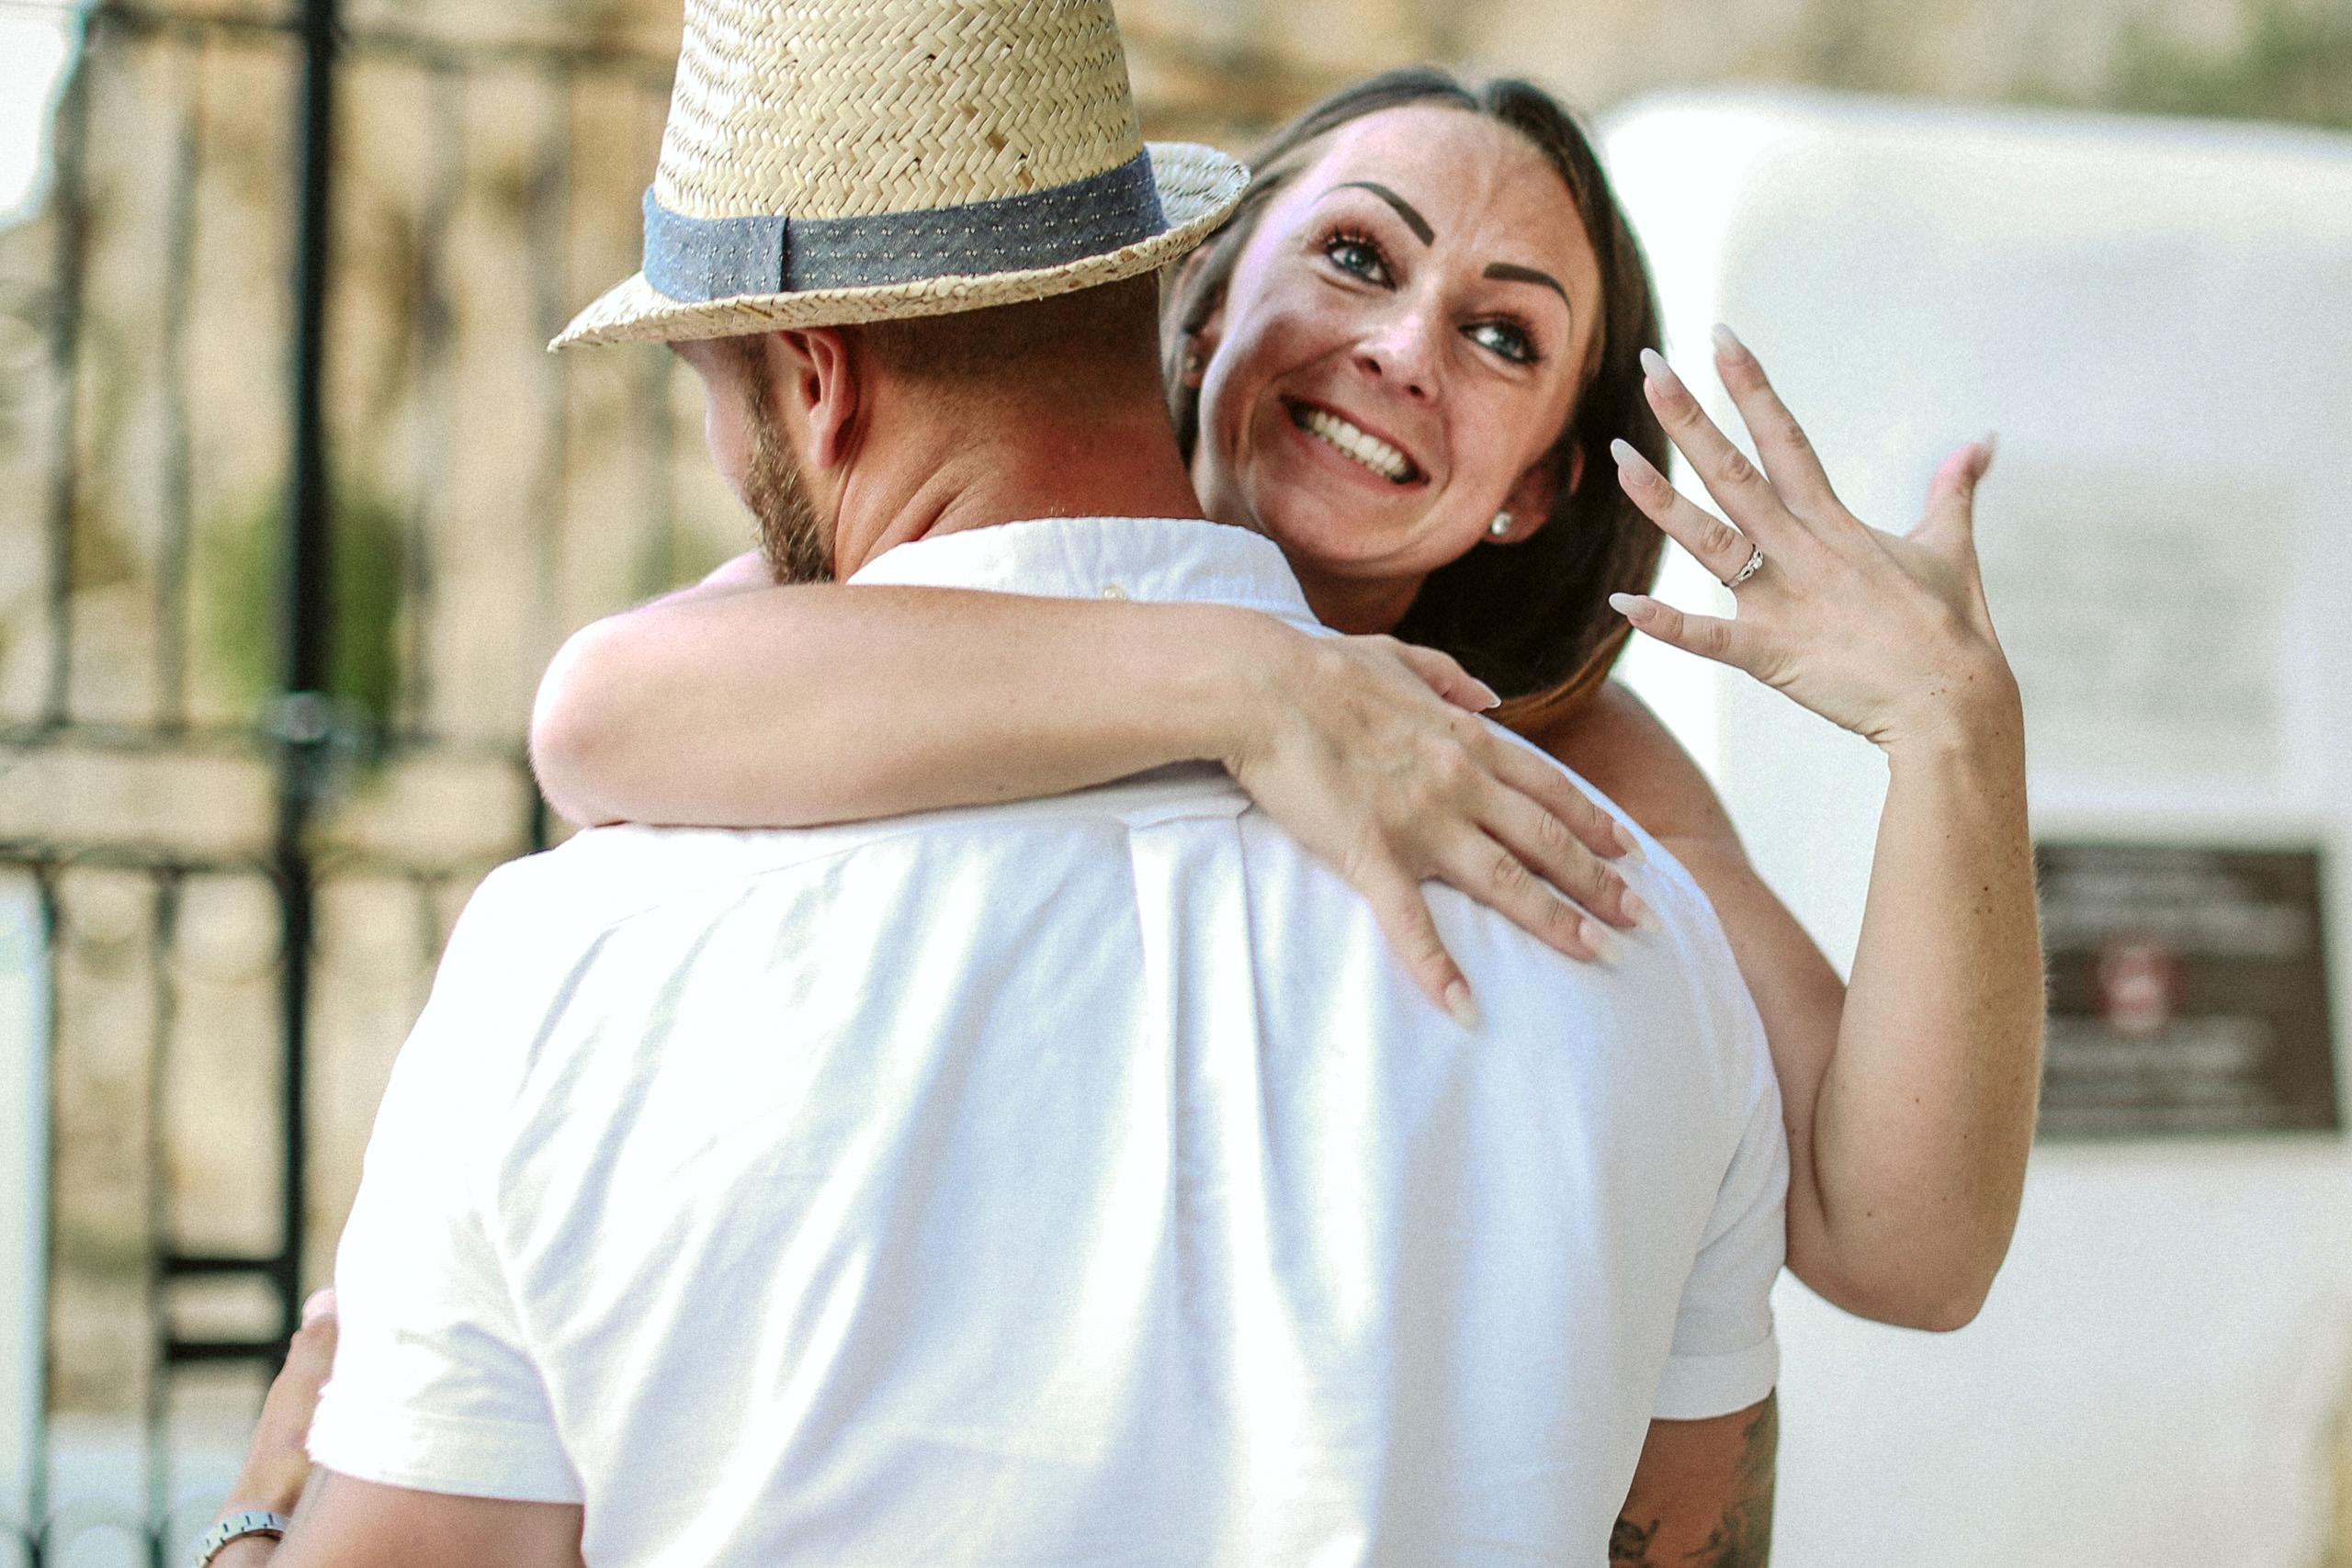 Engagement photo shoot lands St Pails bay wedding photography proposal